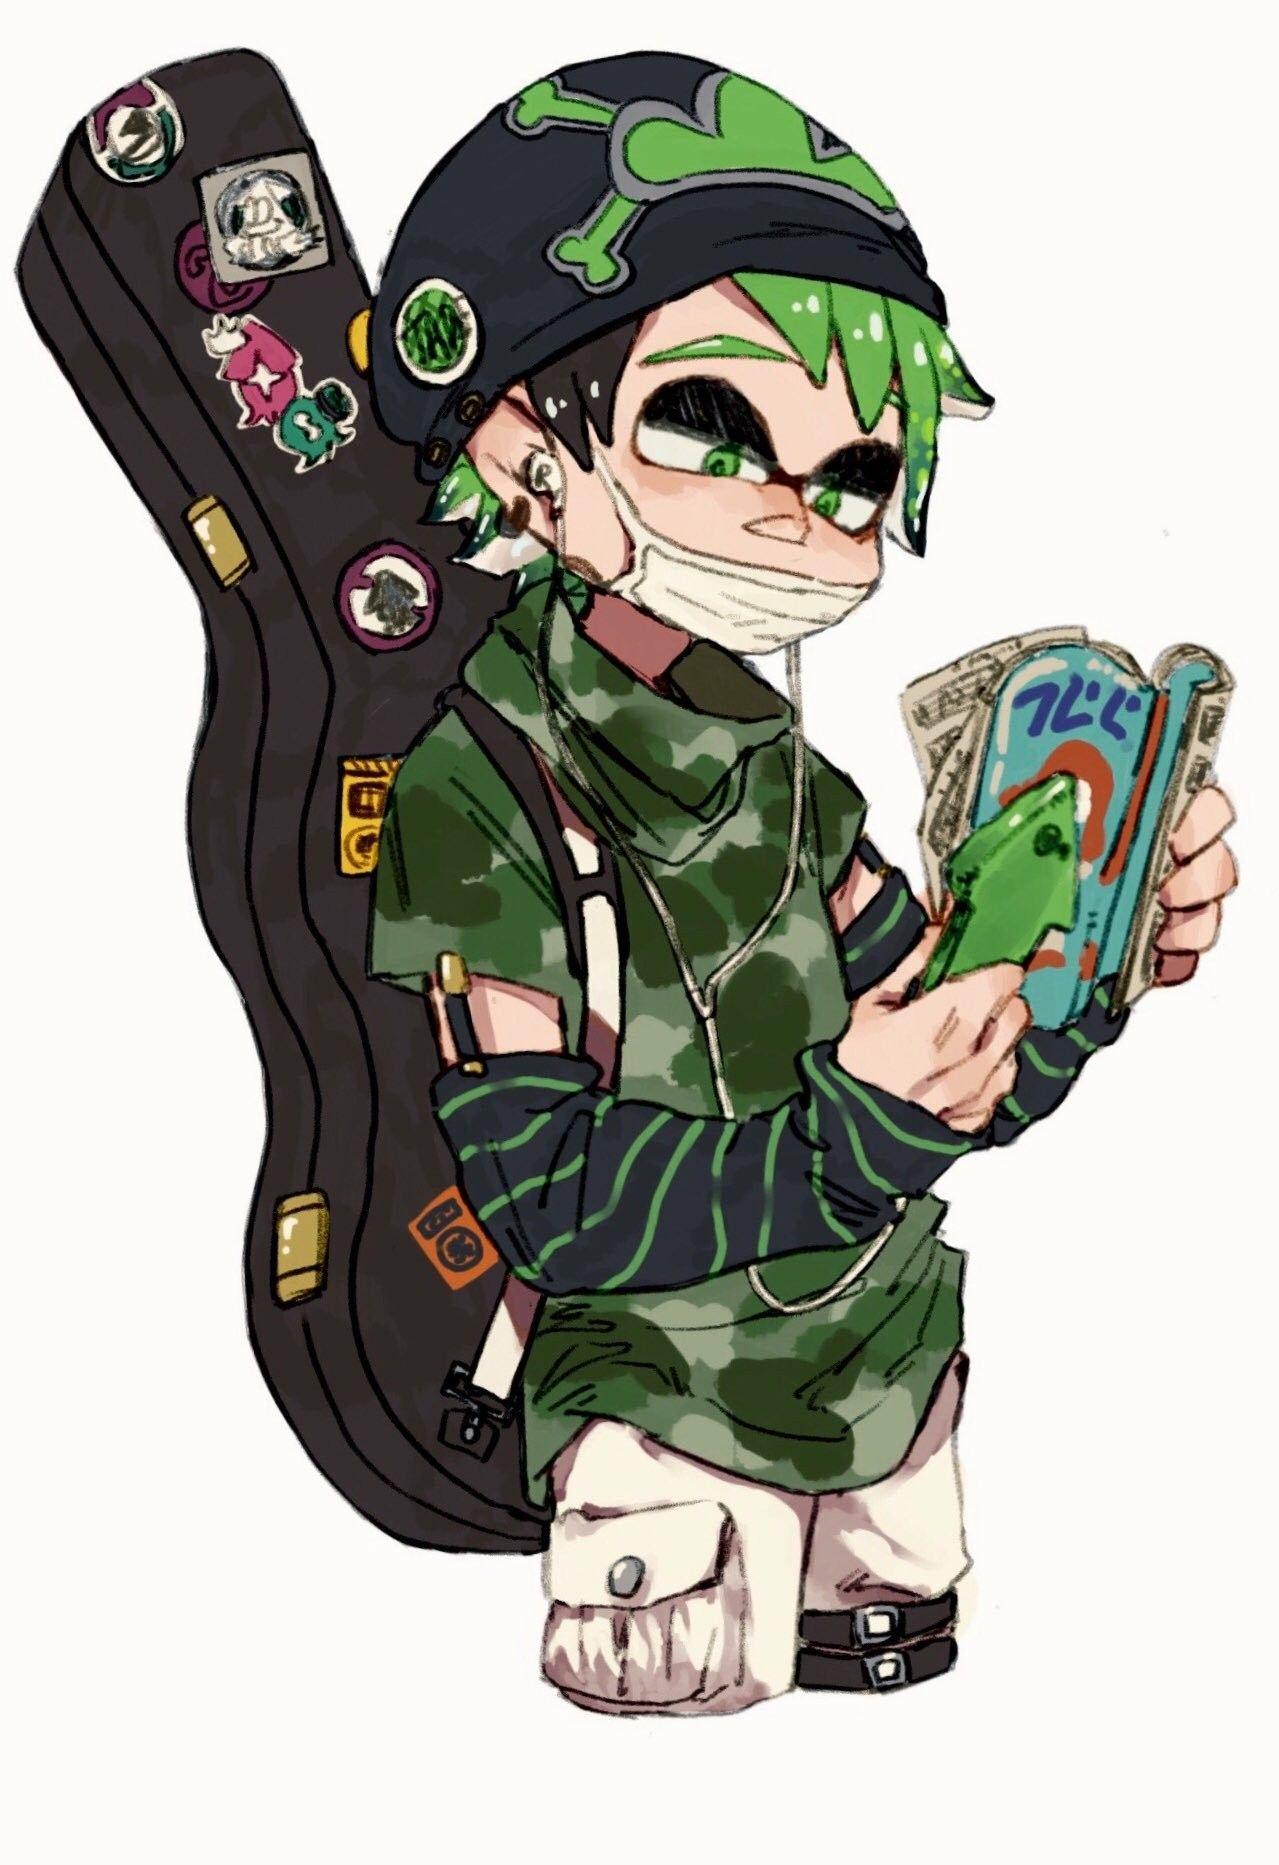 Splatoon 2 boy hairstyles pin by zarinie on splan  pinterest  nintendo and video games